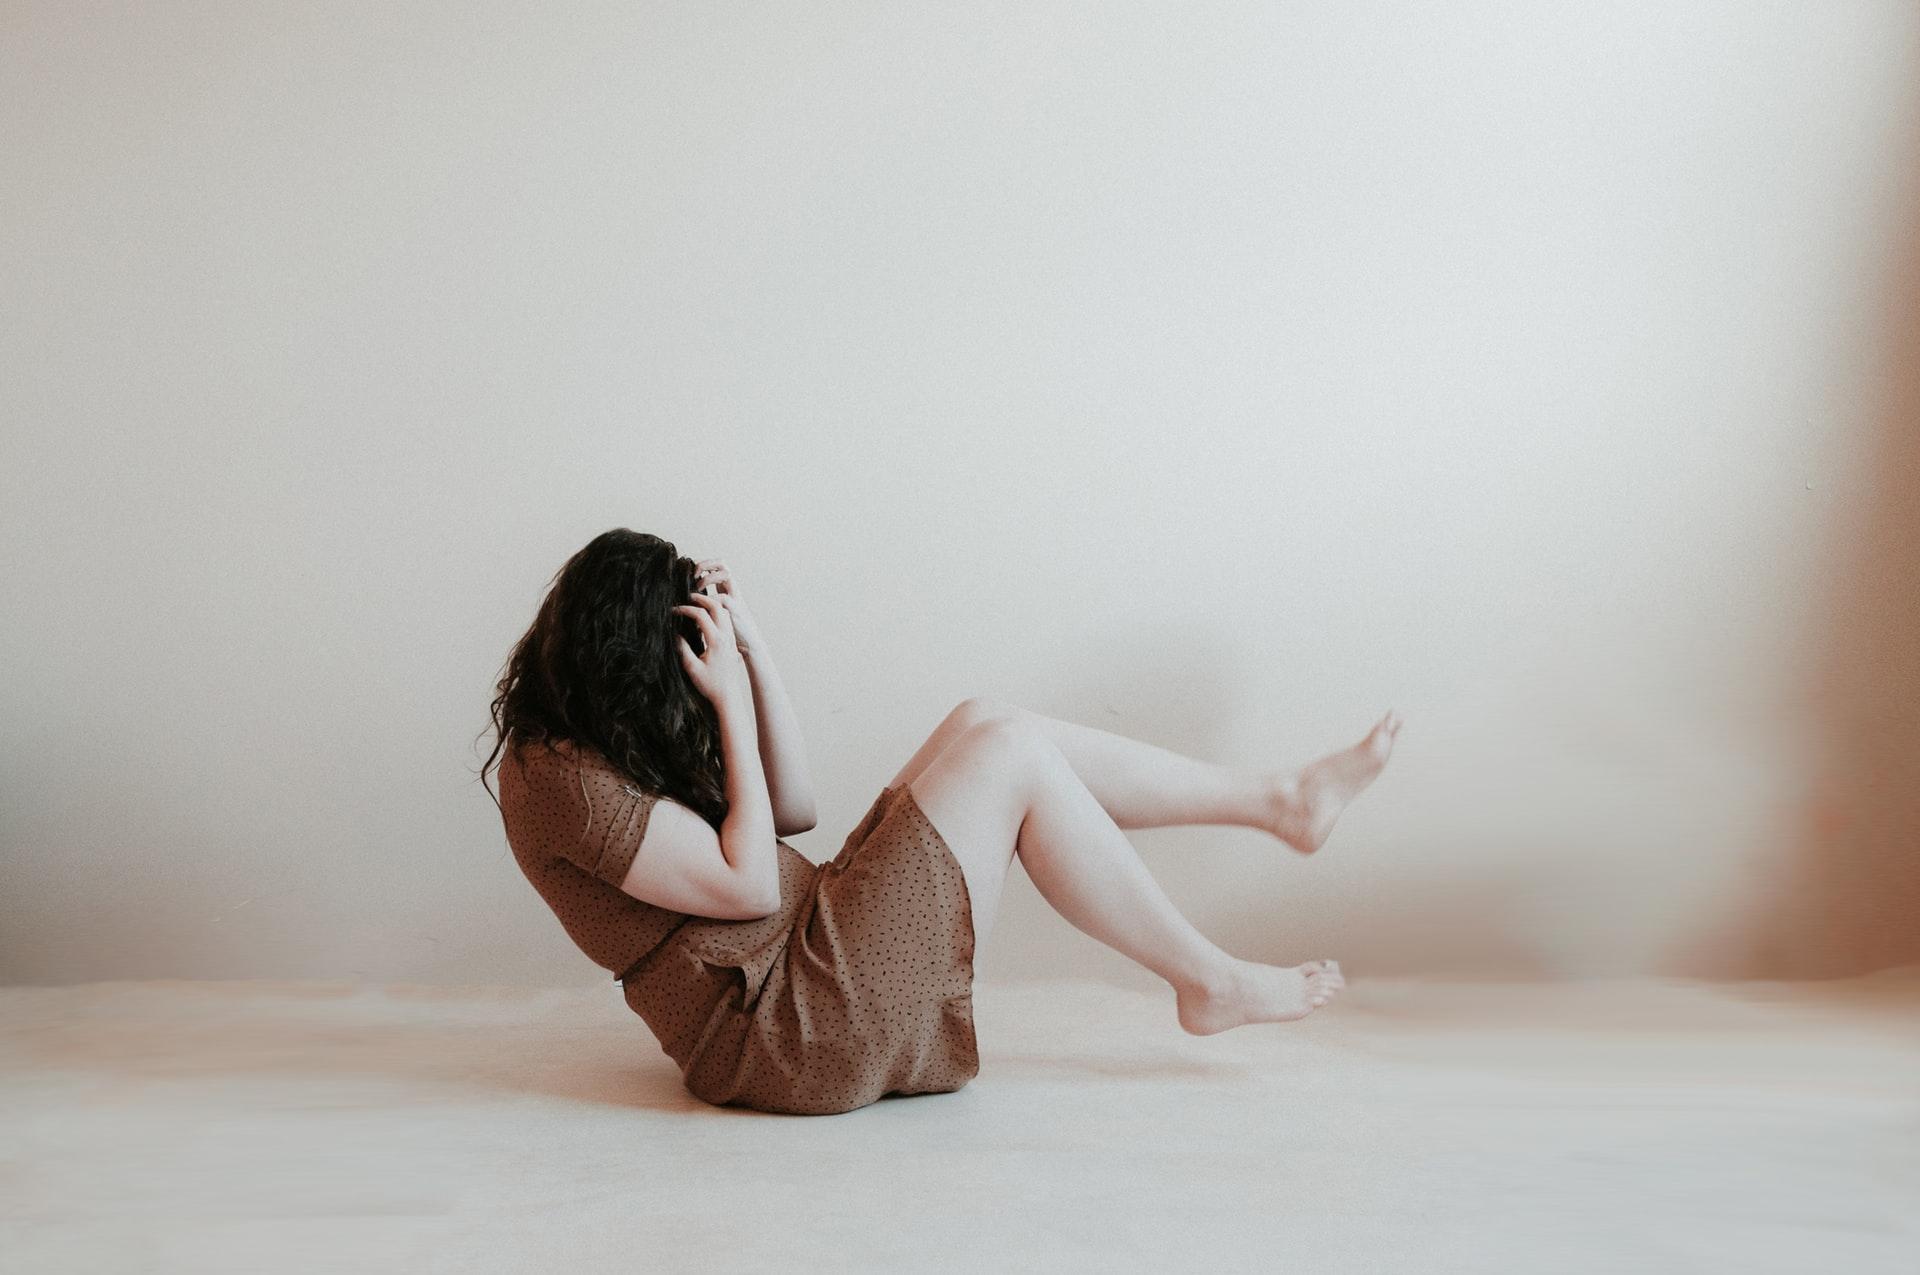 woman sitting on floor wearing brown dress